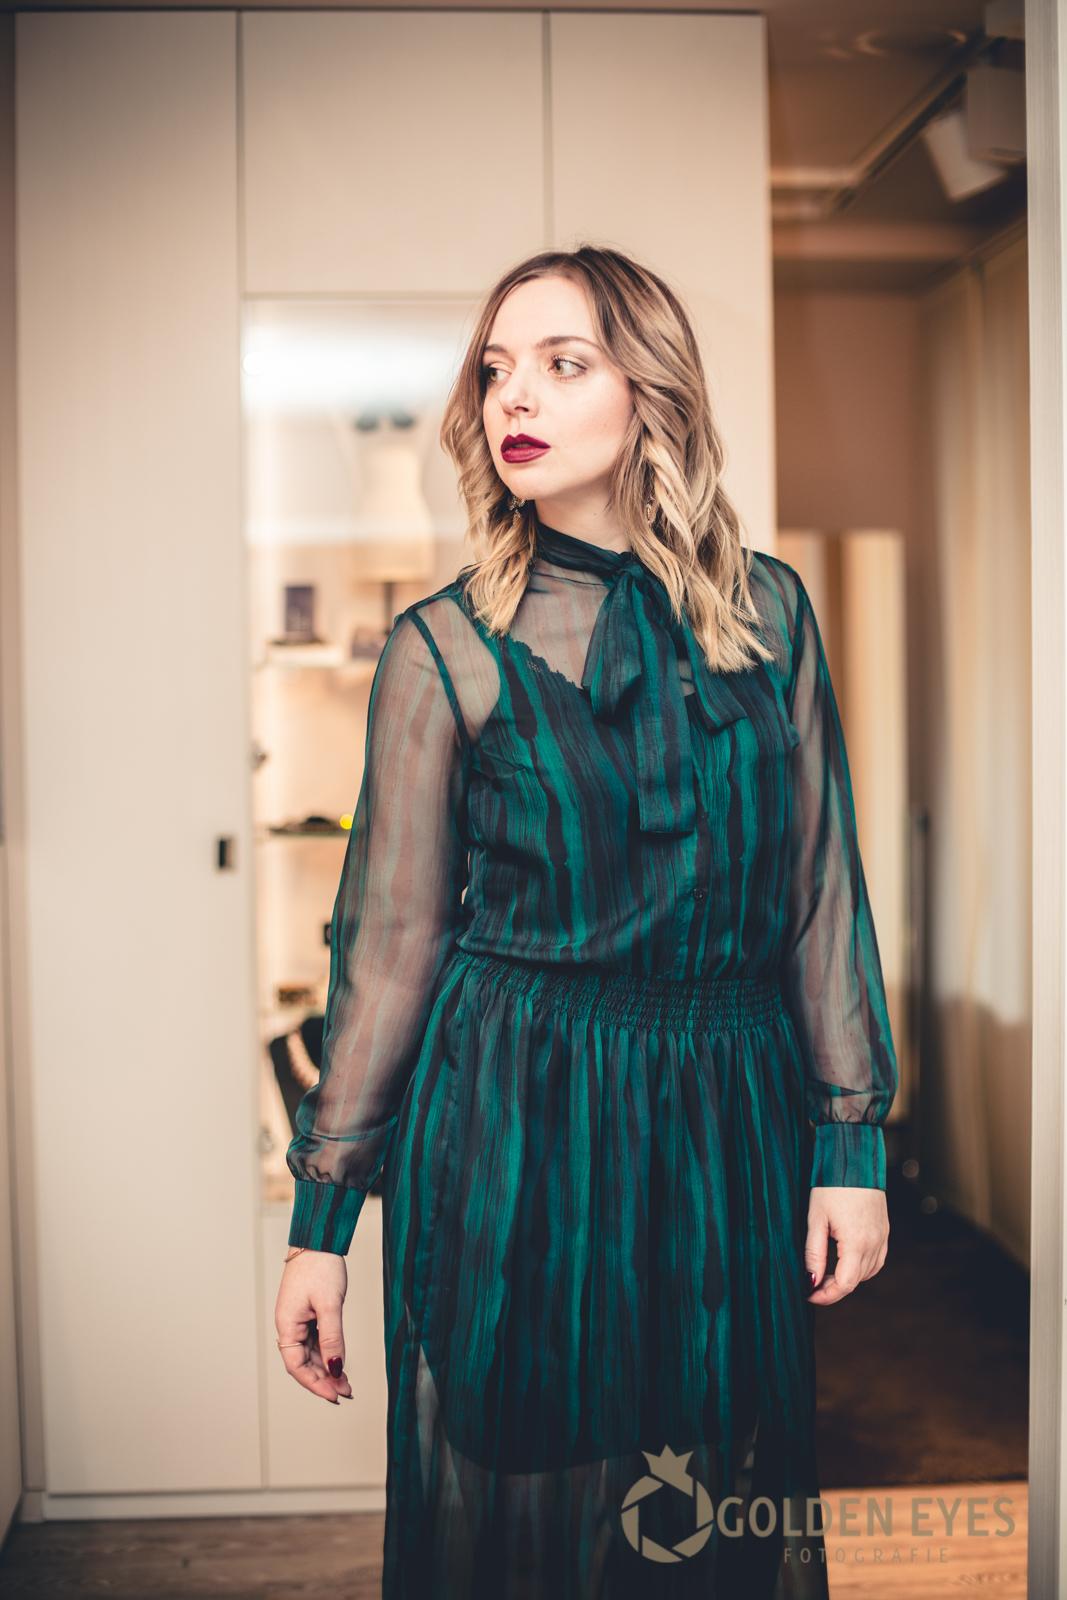 Dress: J. Lindeberg